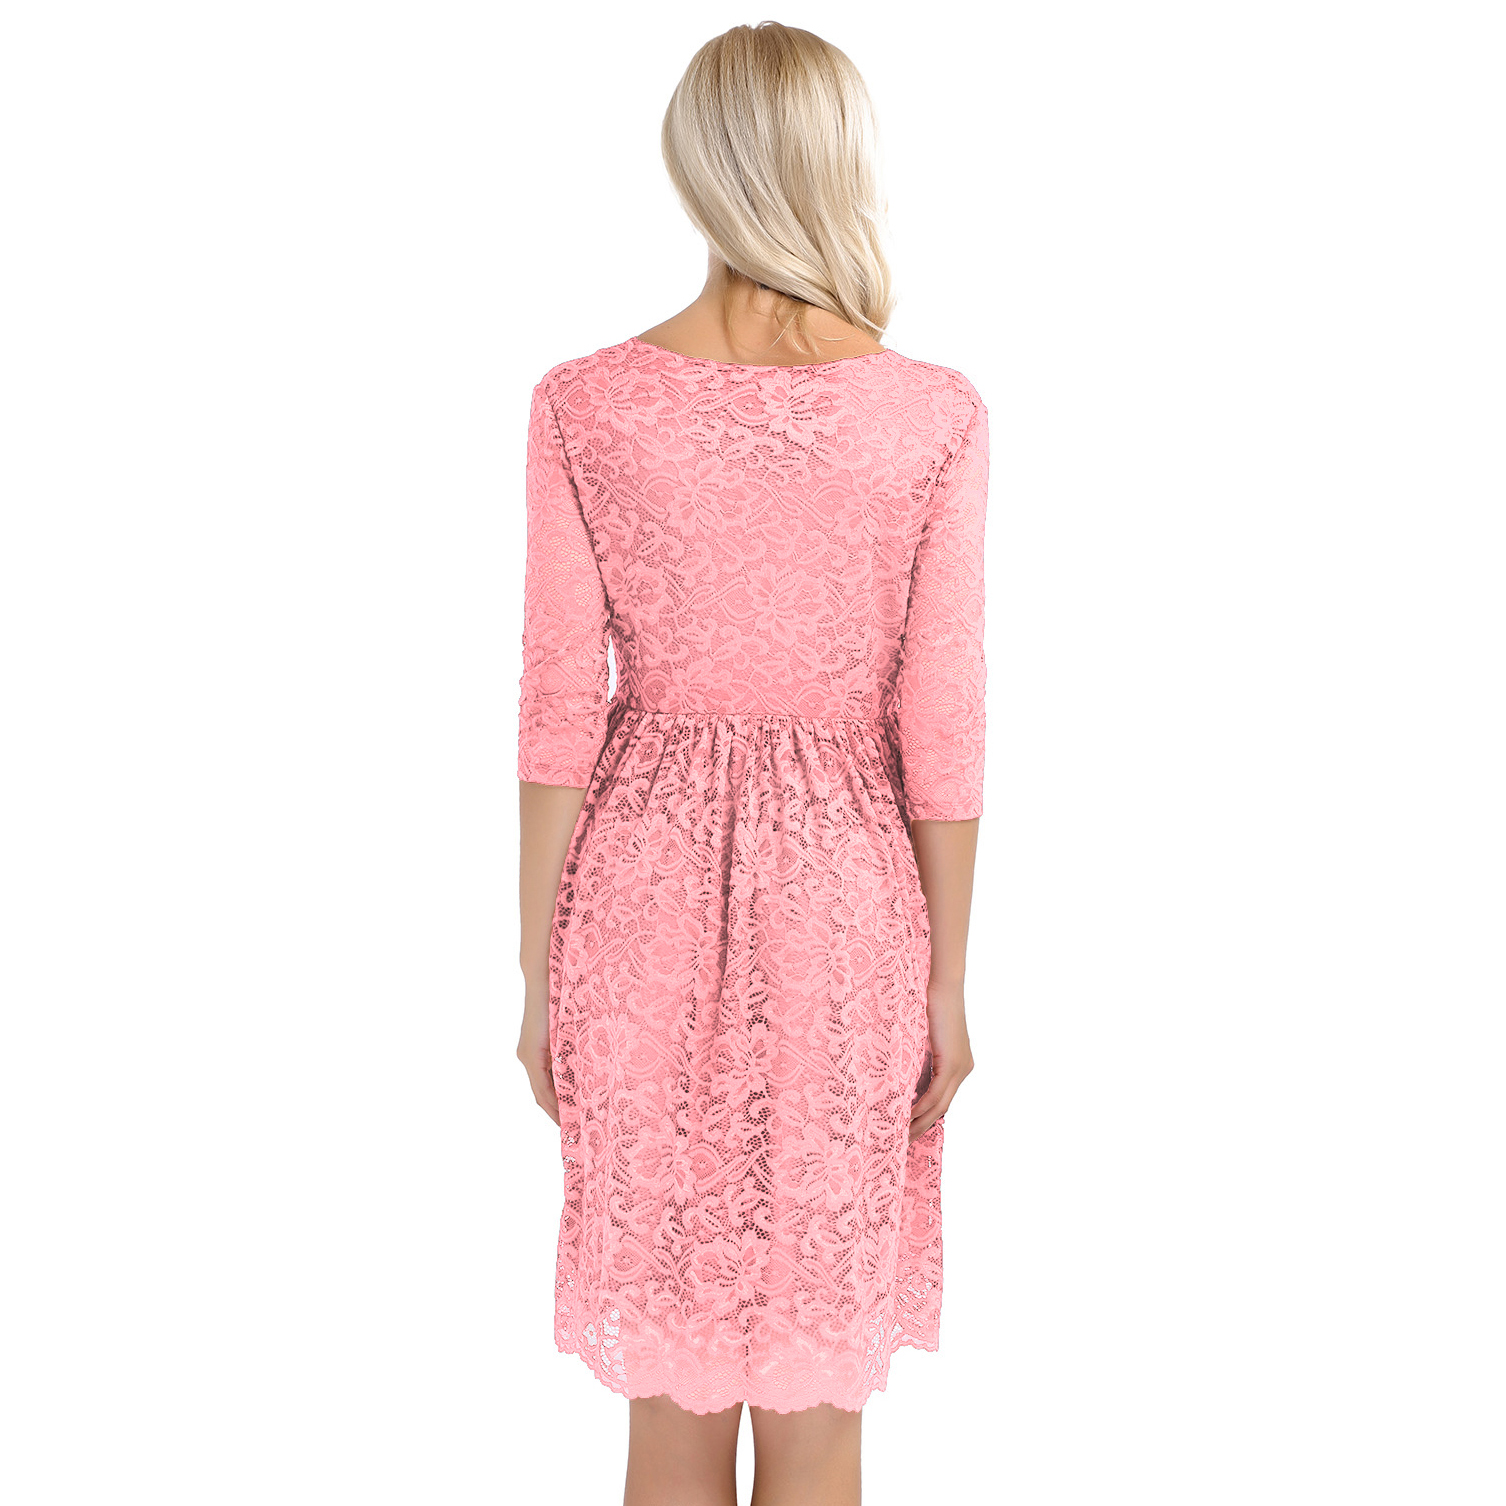 Image 4 - Womens Femme Maternity Elegant Dress Floral Lace Overlay V Neck Half Sleeve Pregnant Photography Dress for Take Part WeedingDresses   -